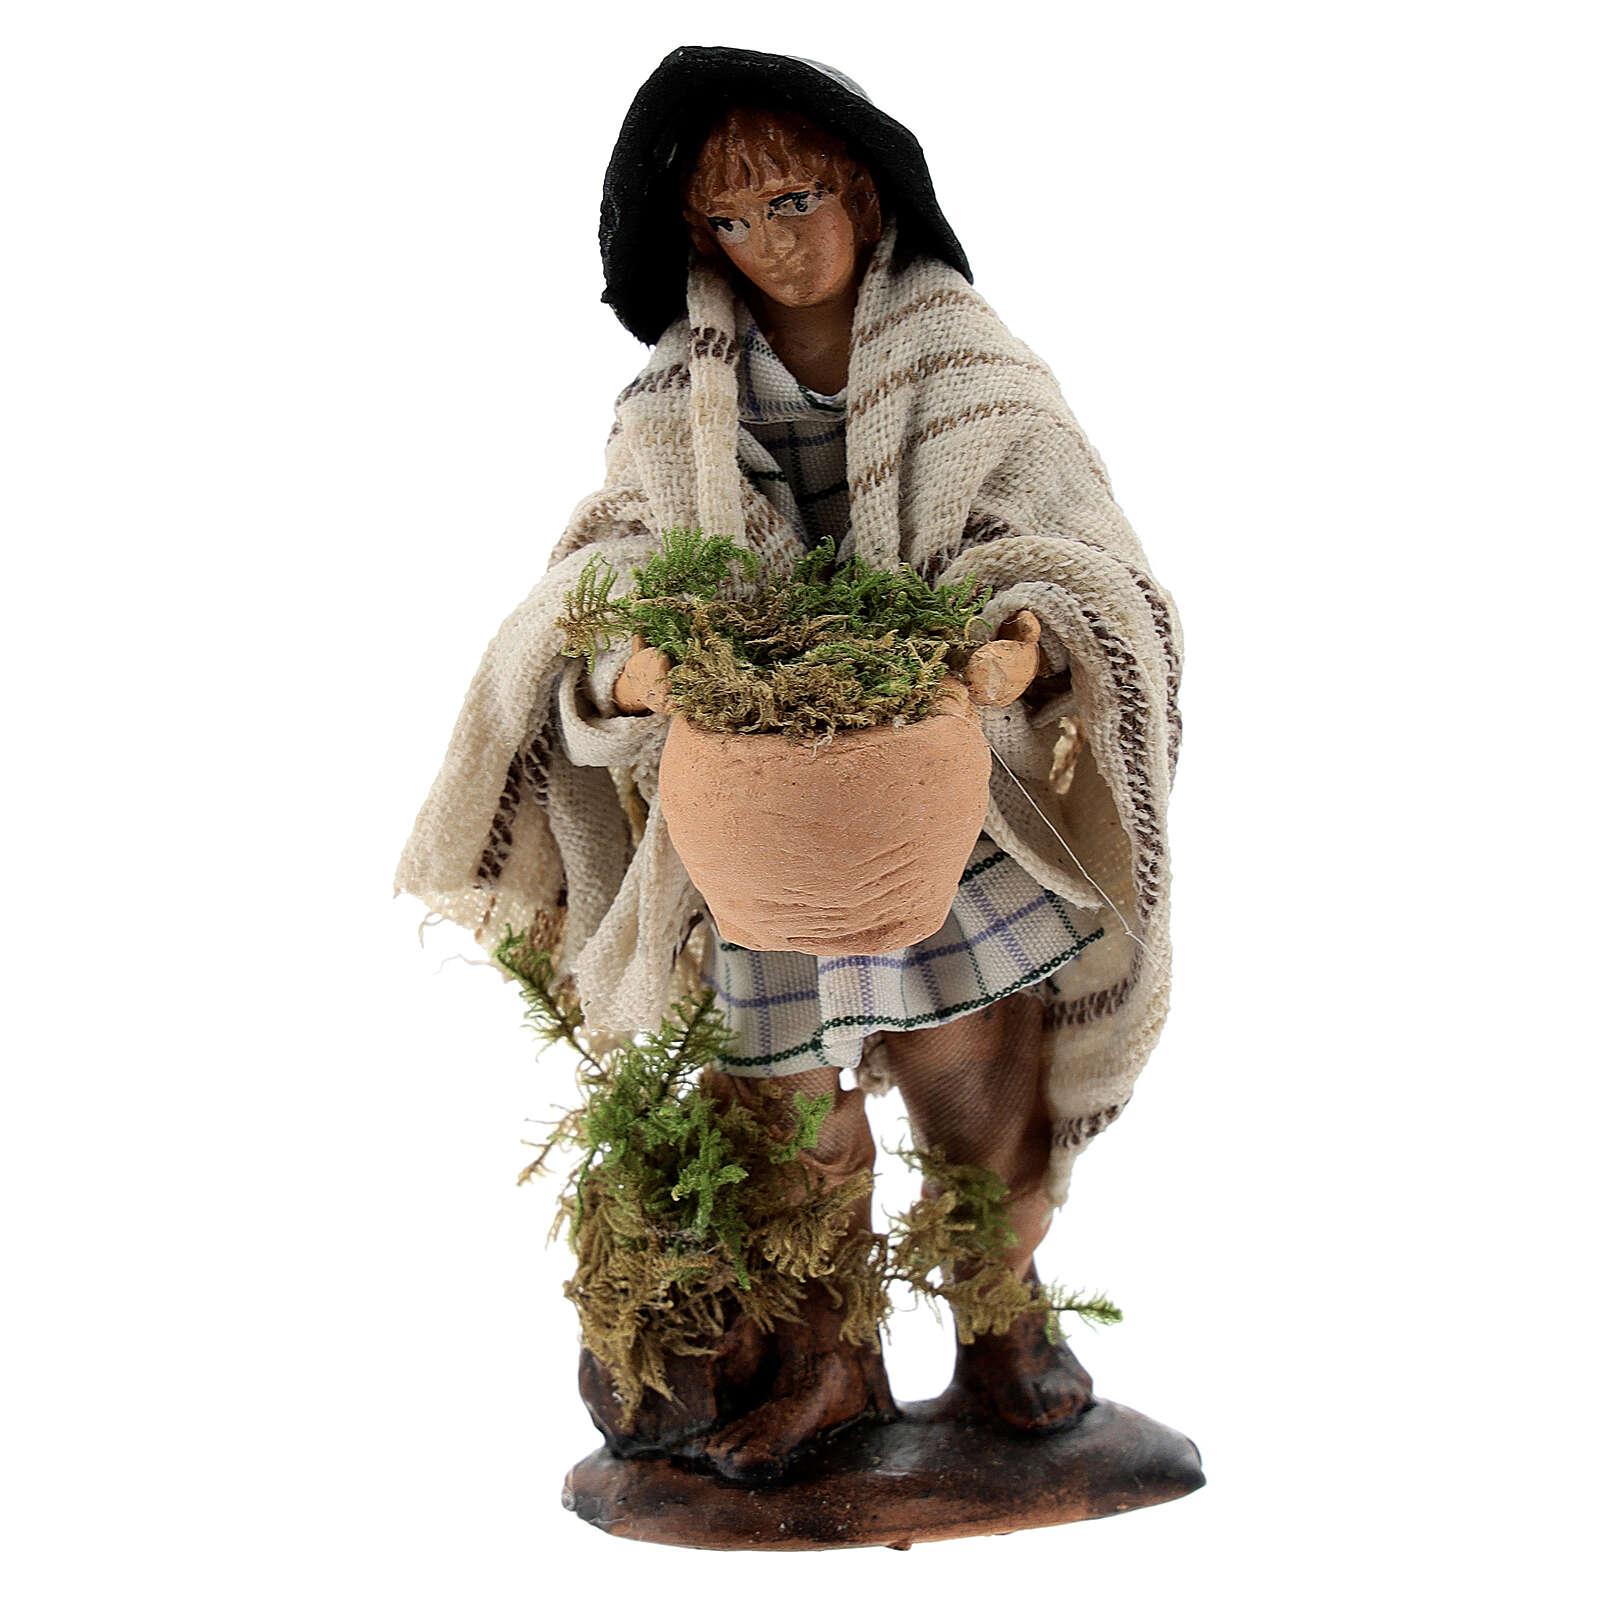 Shepherd with moss basket 8 cm Neapolitan nativity figurine 4